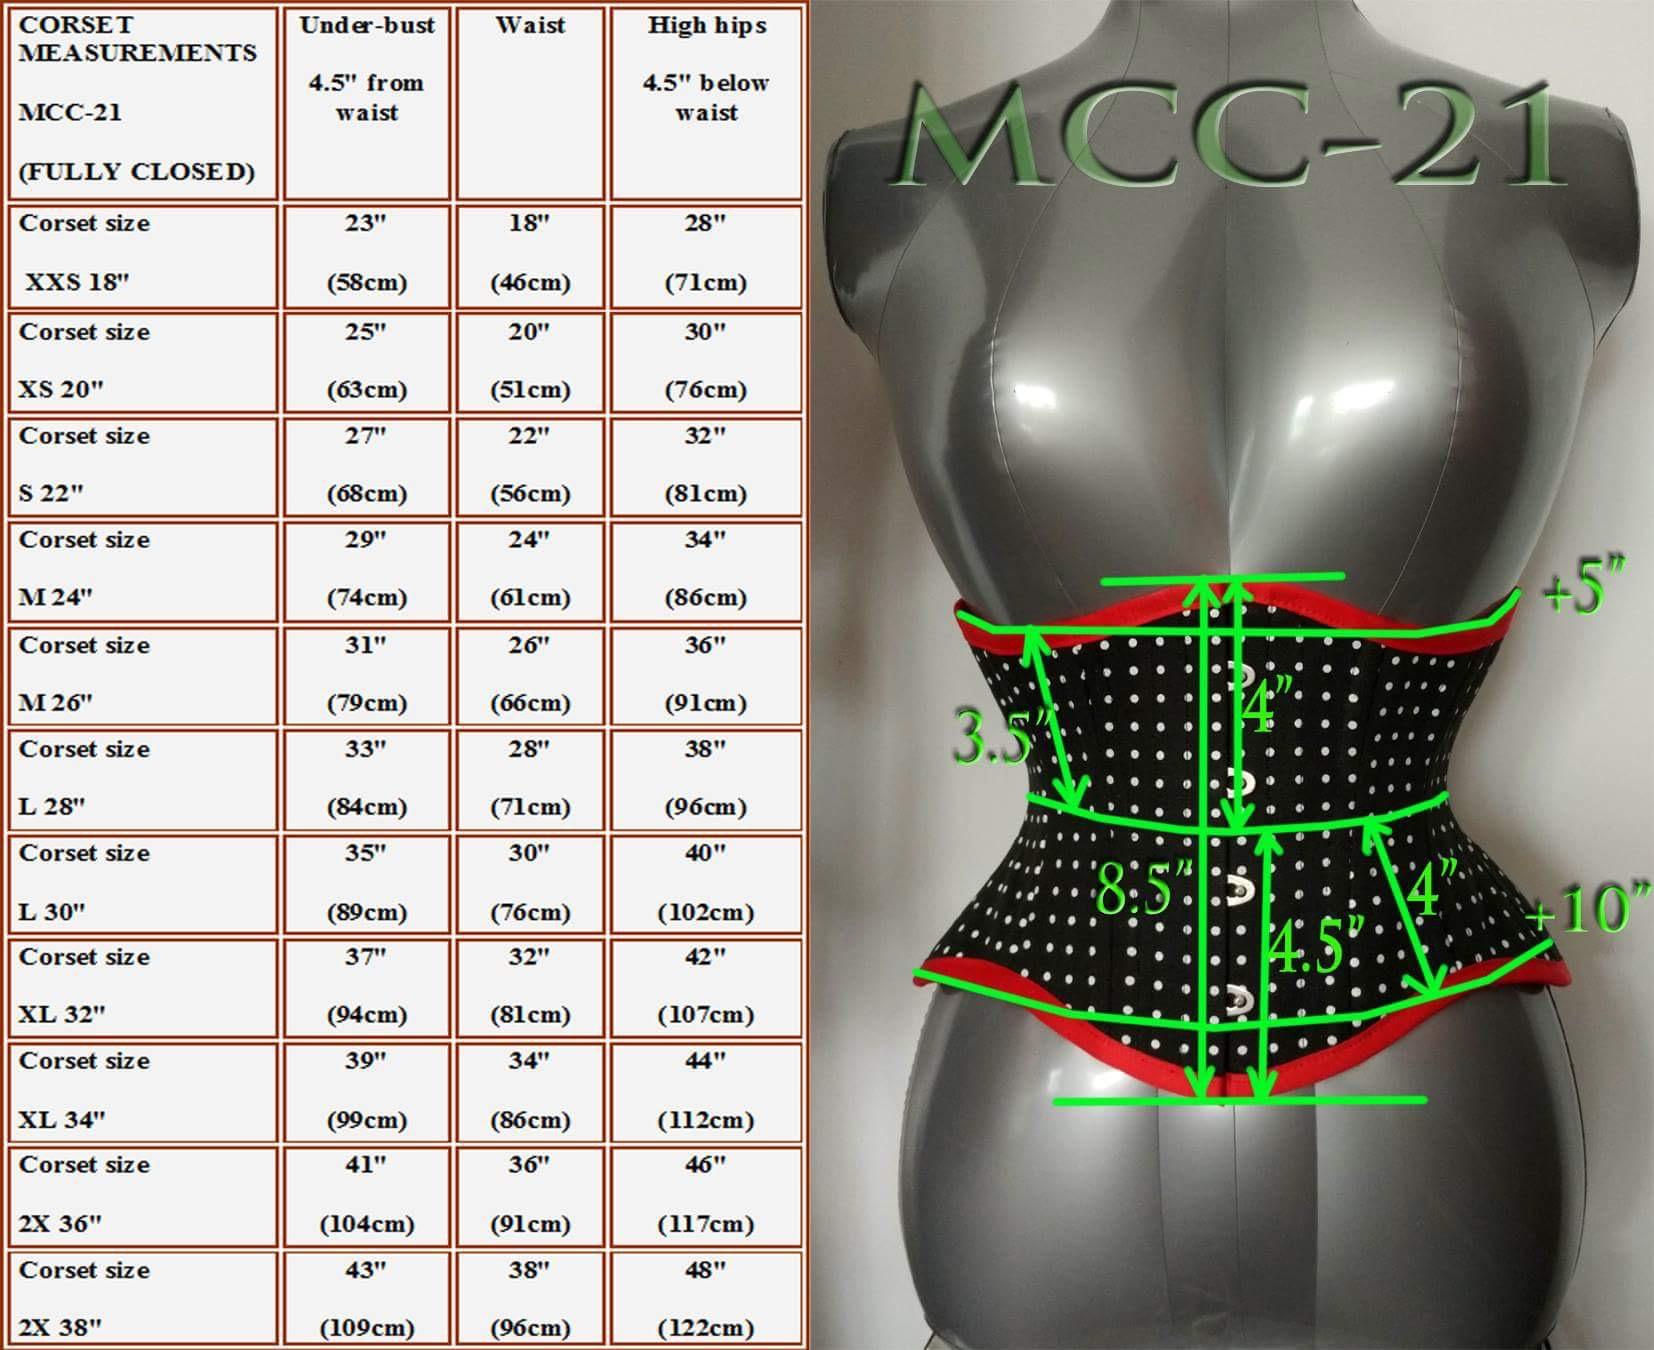 MCC21 Polka Dot Cotton Underbust Corset